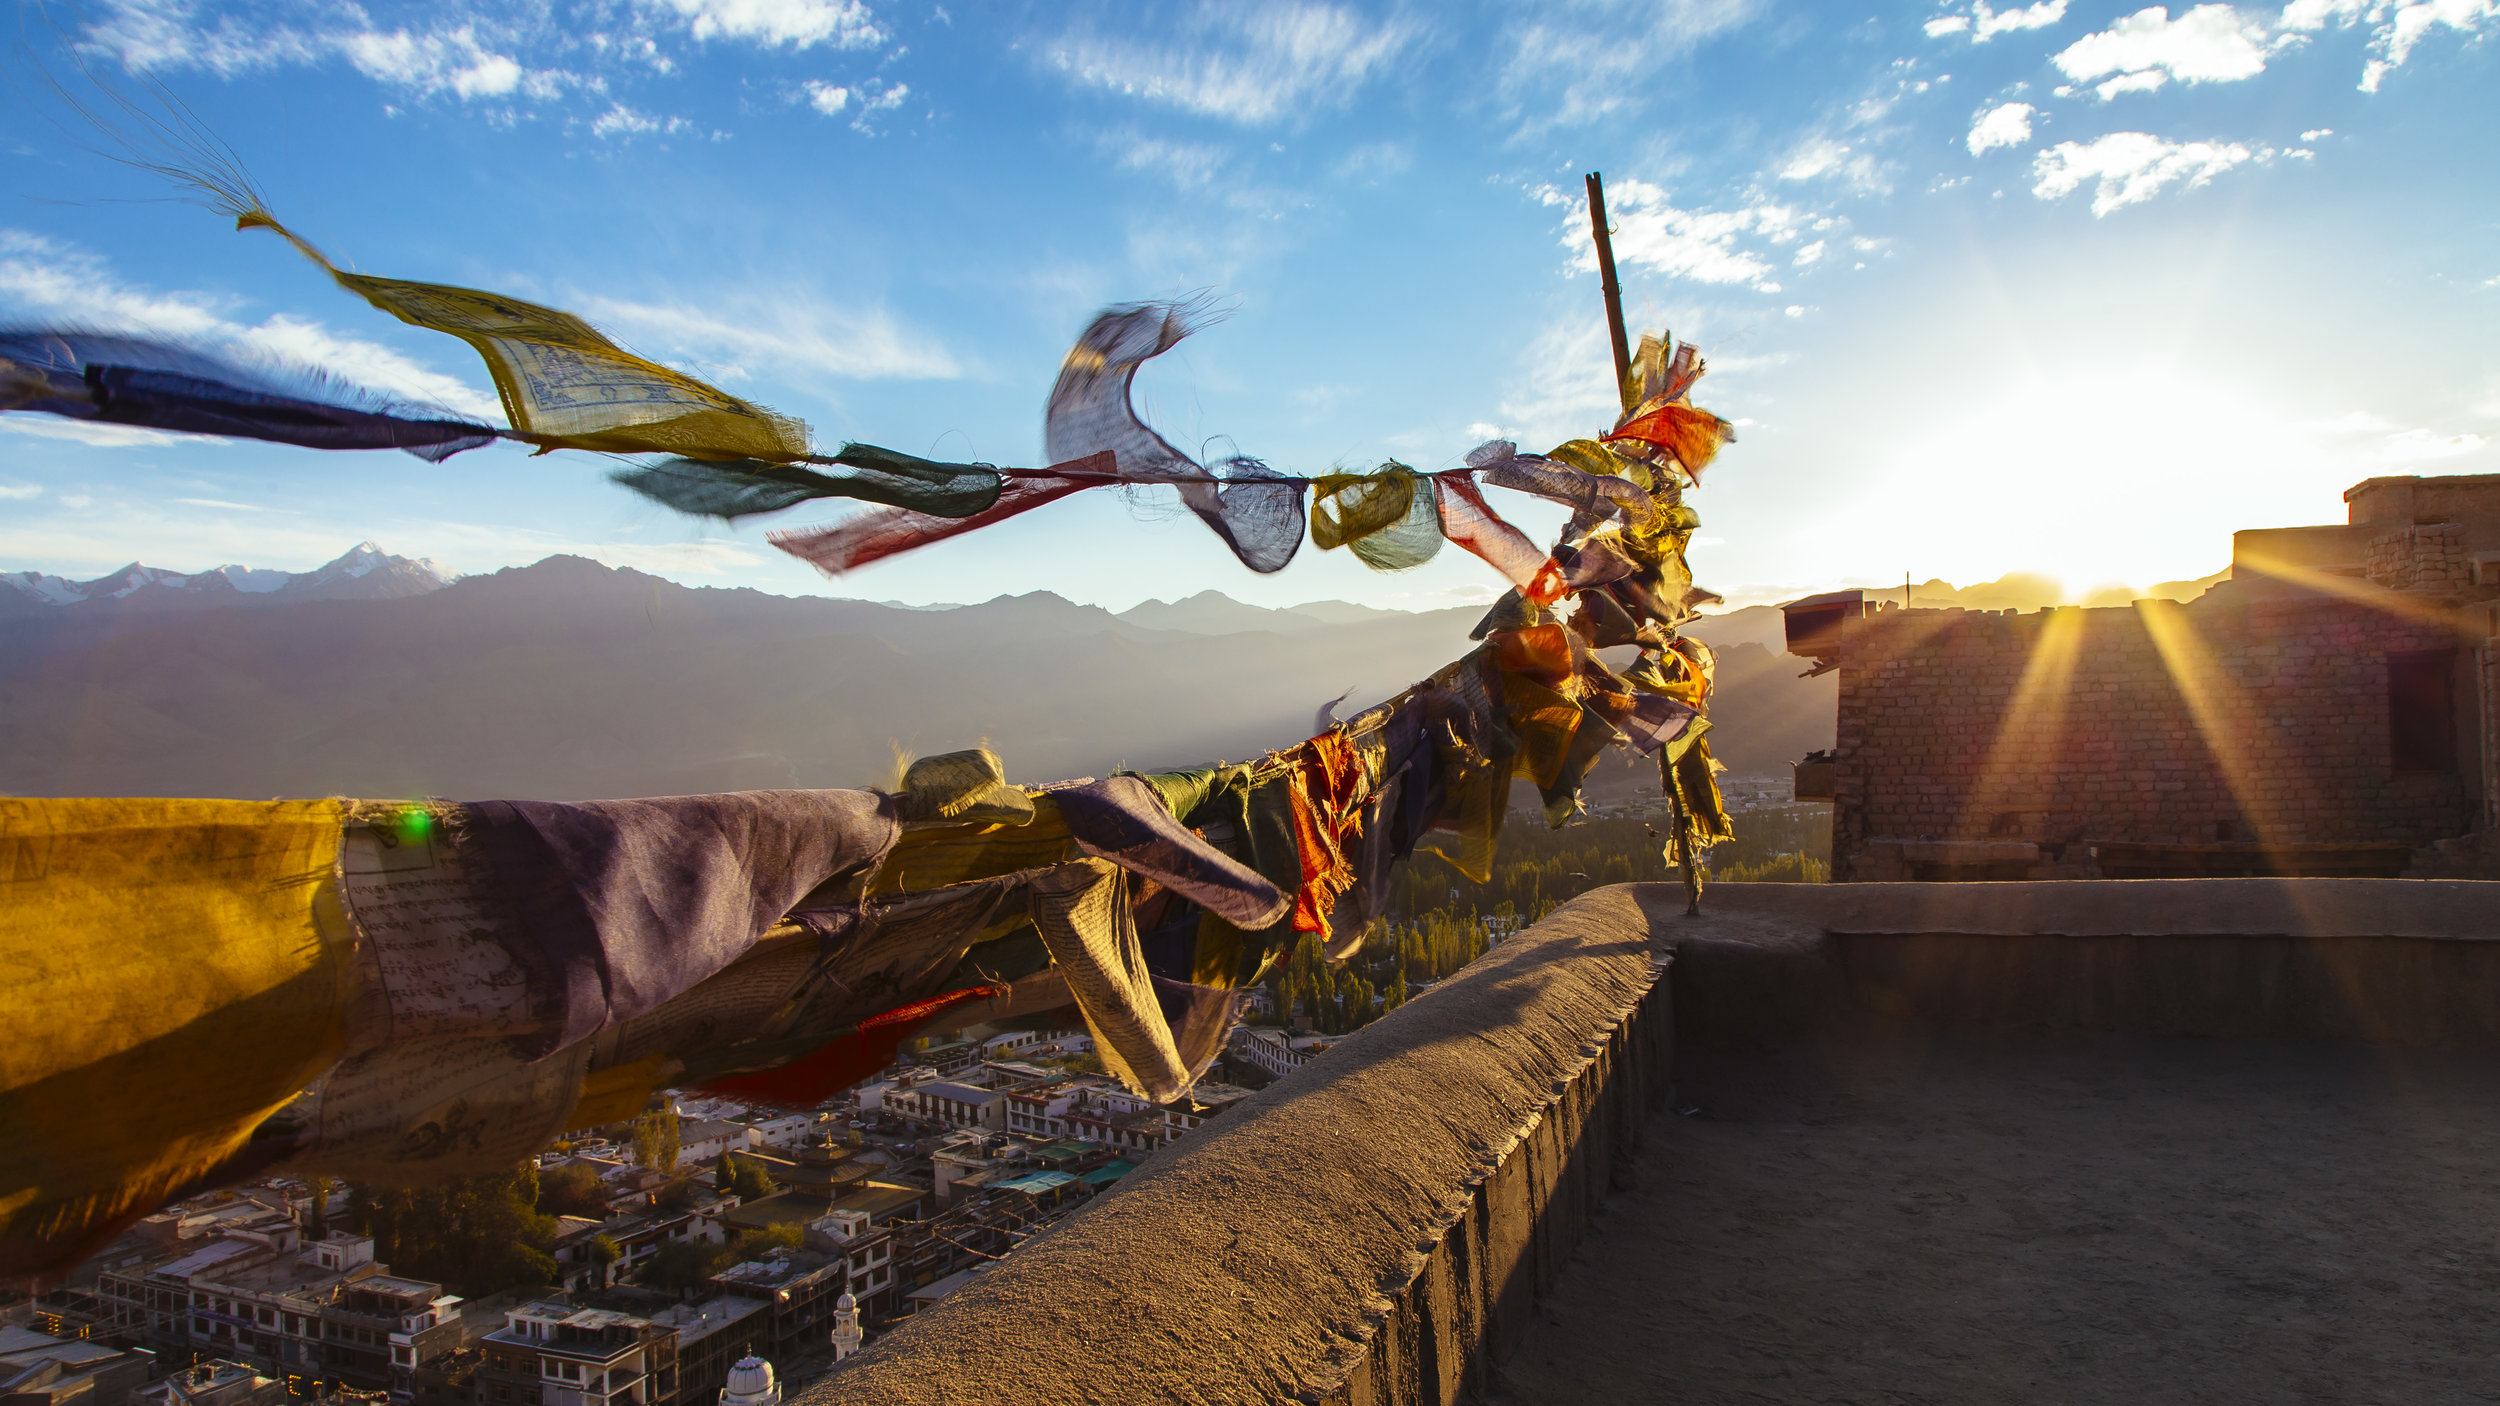 A Himalayan Sunset in Leh city - Ladakh, India.